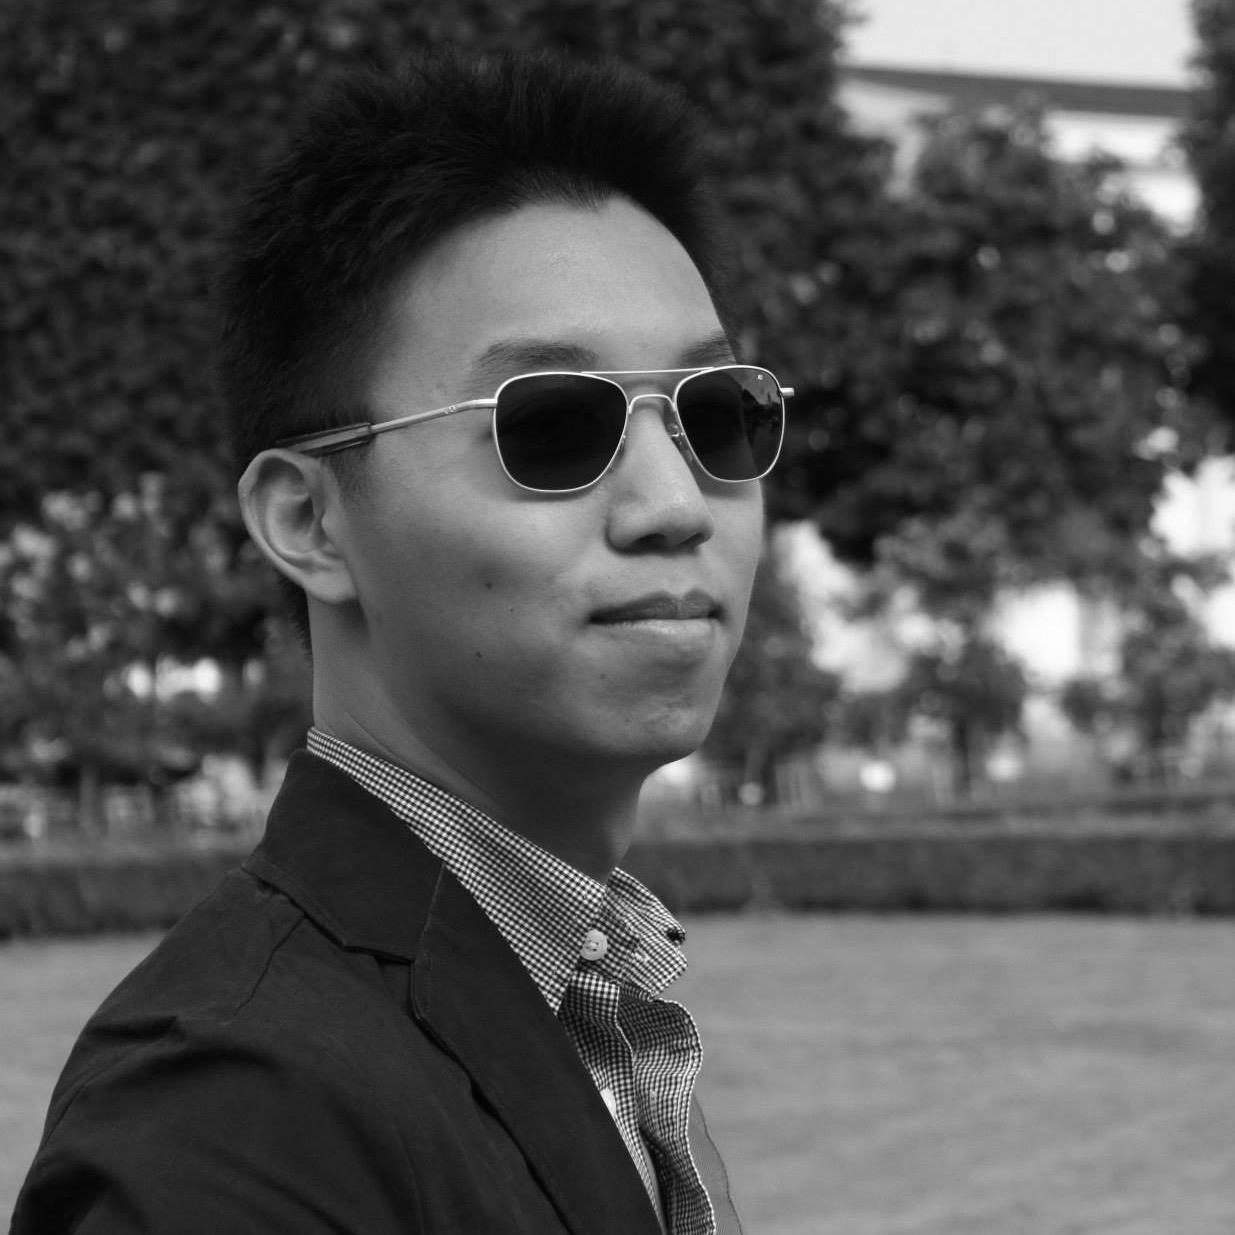 wang_headshot_bw.jpg